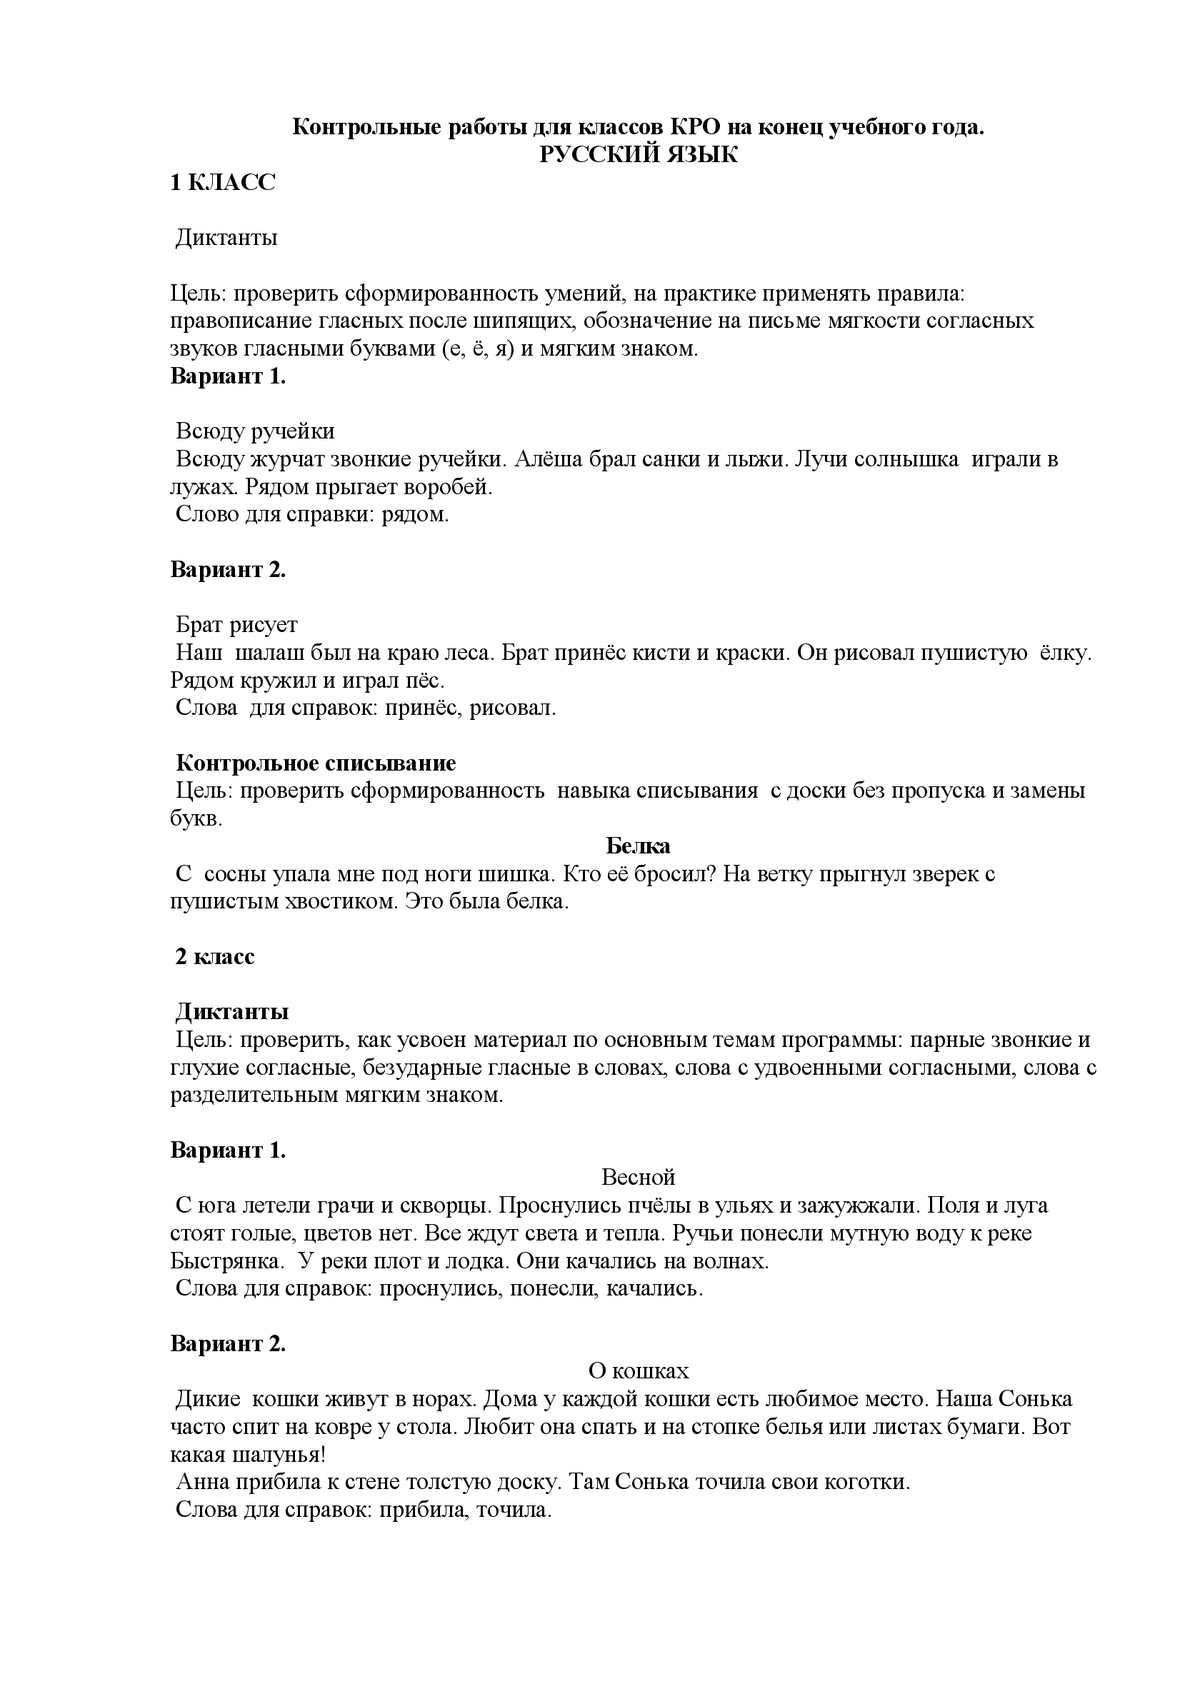 диктанты по русскому языку 1 класс с мягким знаком